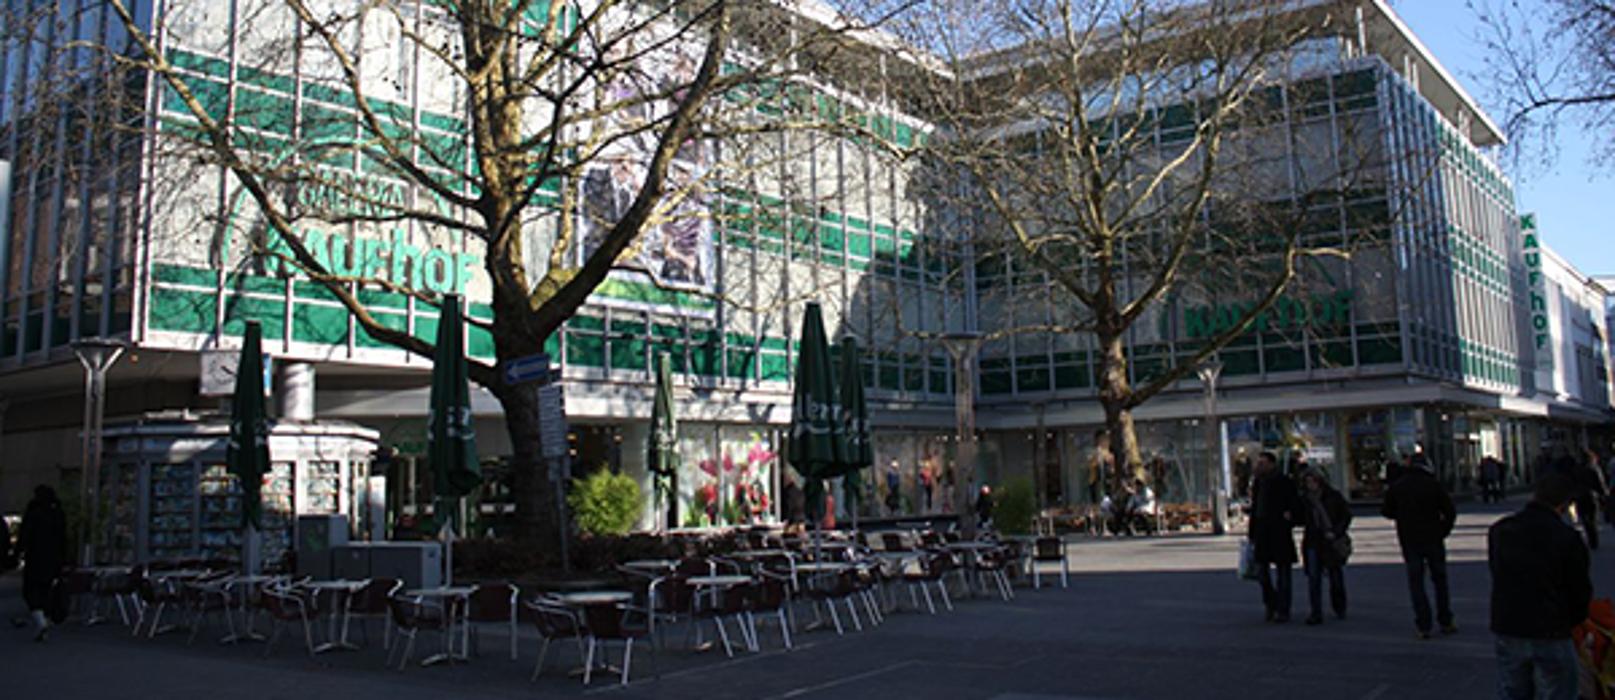 GALERIA (Kaufhof) Krefeld, Hochstraße in Krefeld